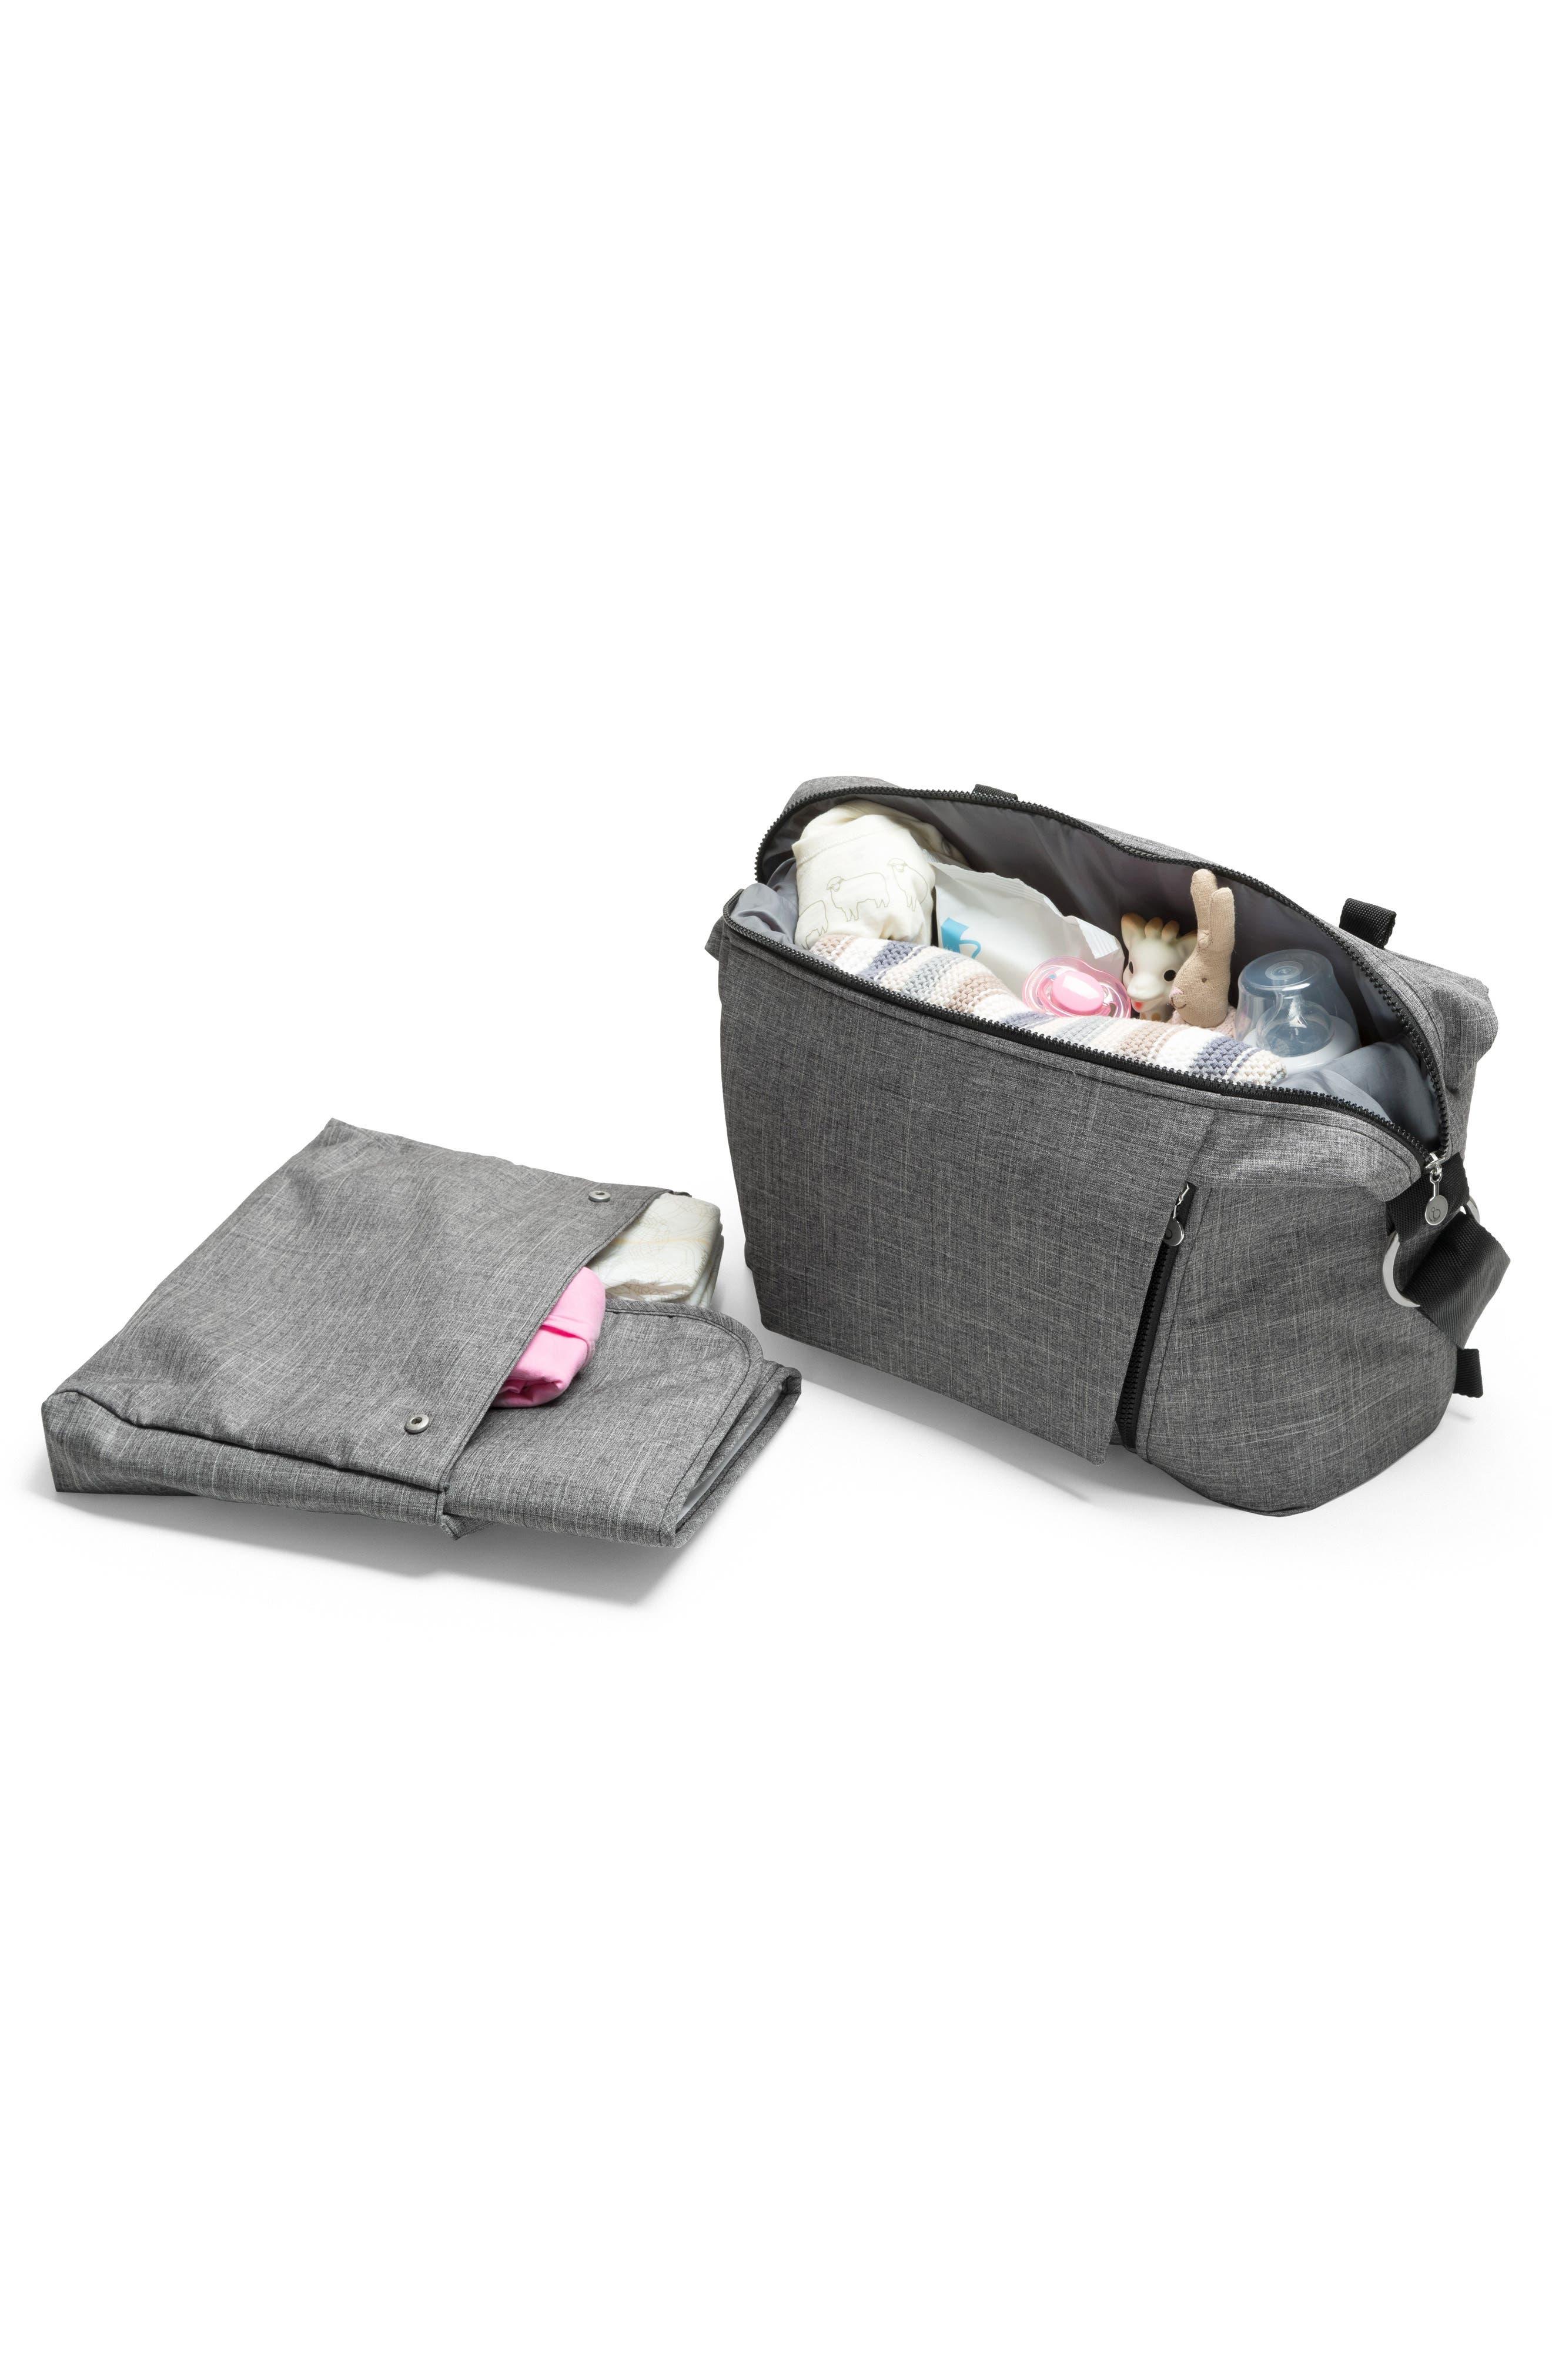 Alternate Image 2  - Stokke Changing Diaper Bag